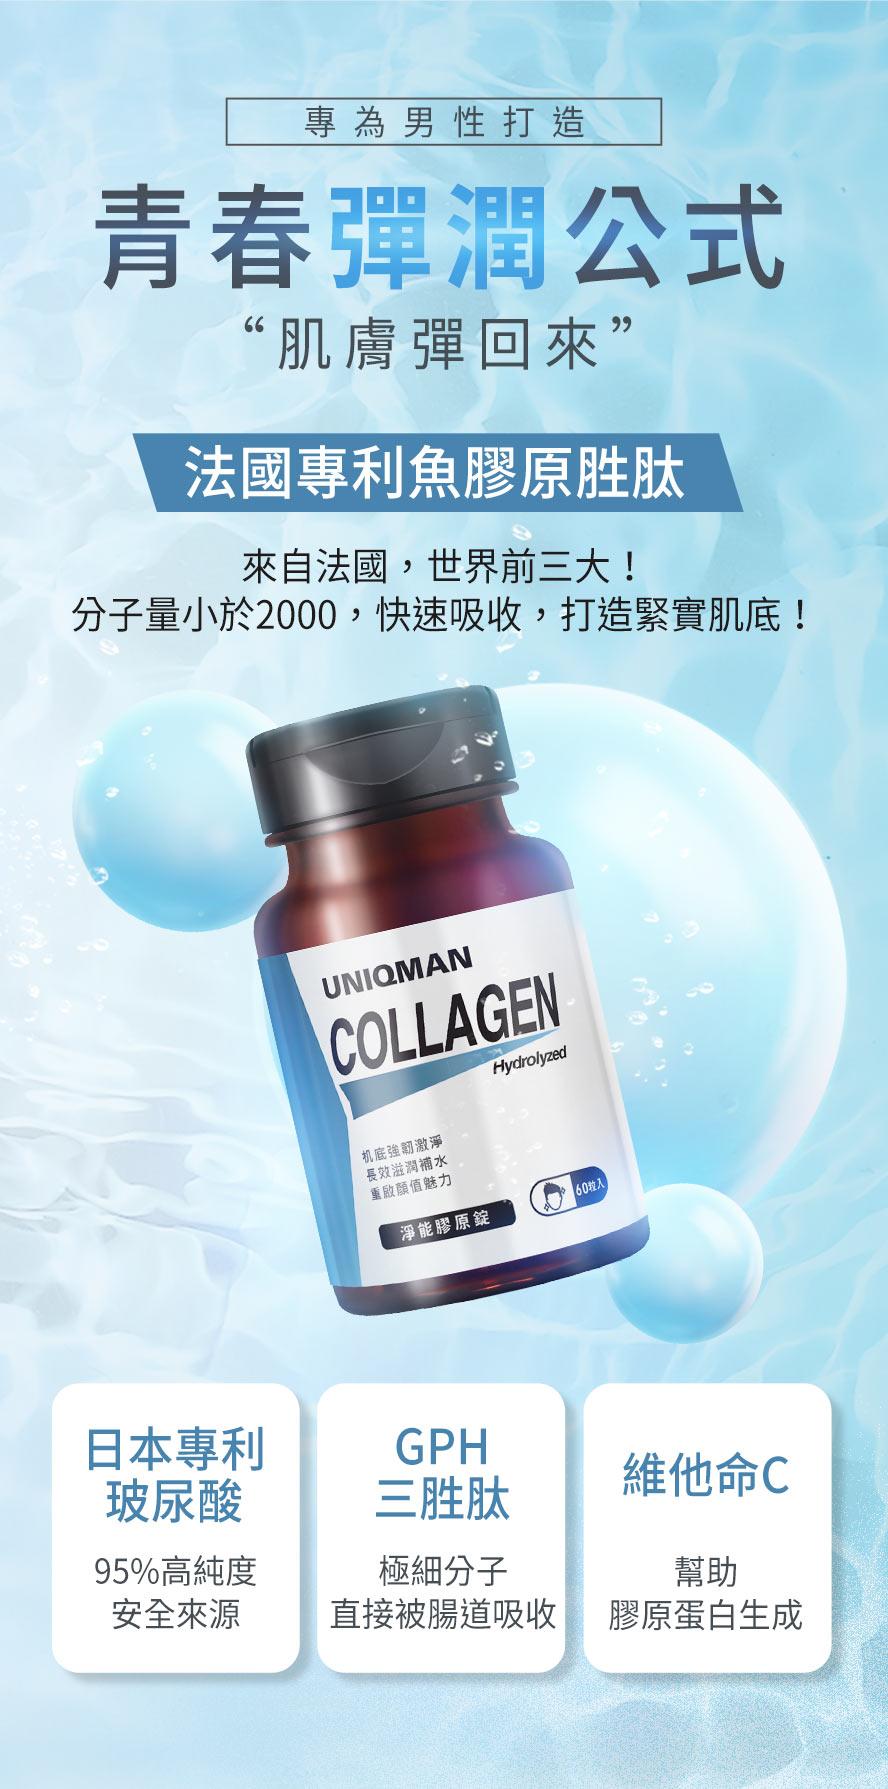 UNIQMAN淨能膠原分子量只有2000Da,是市面上最適合人體吸收的膠原蛋白